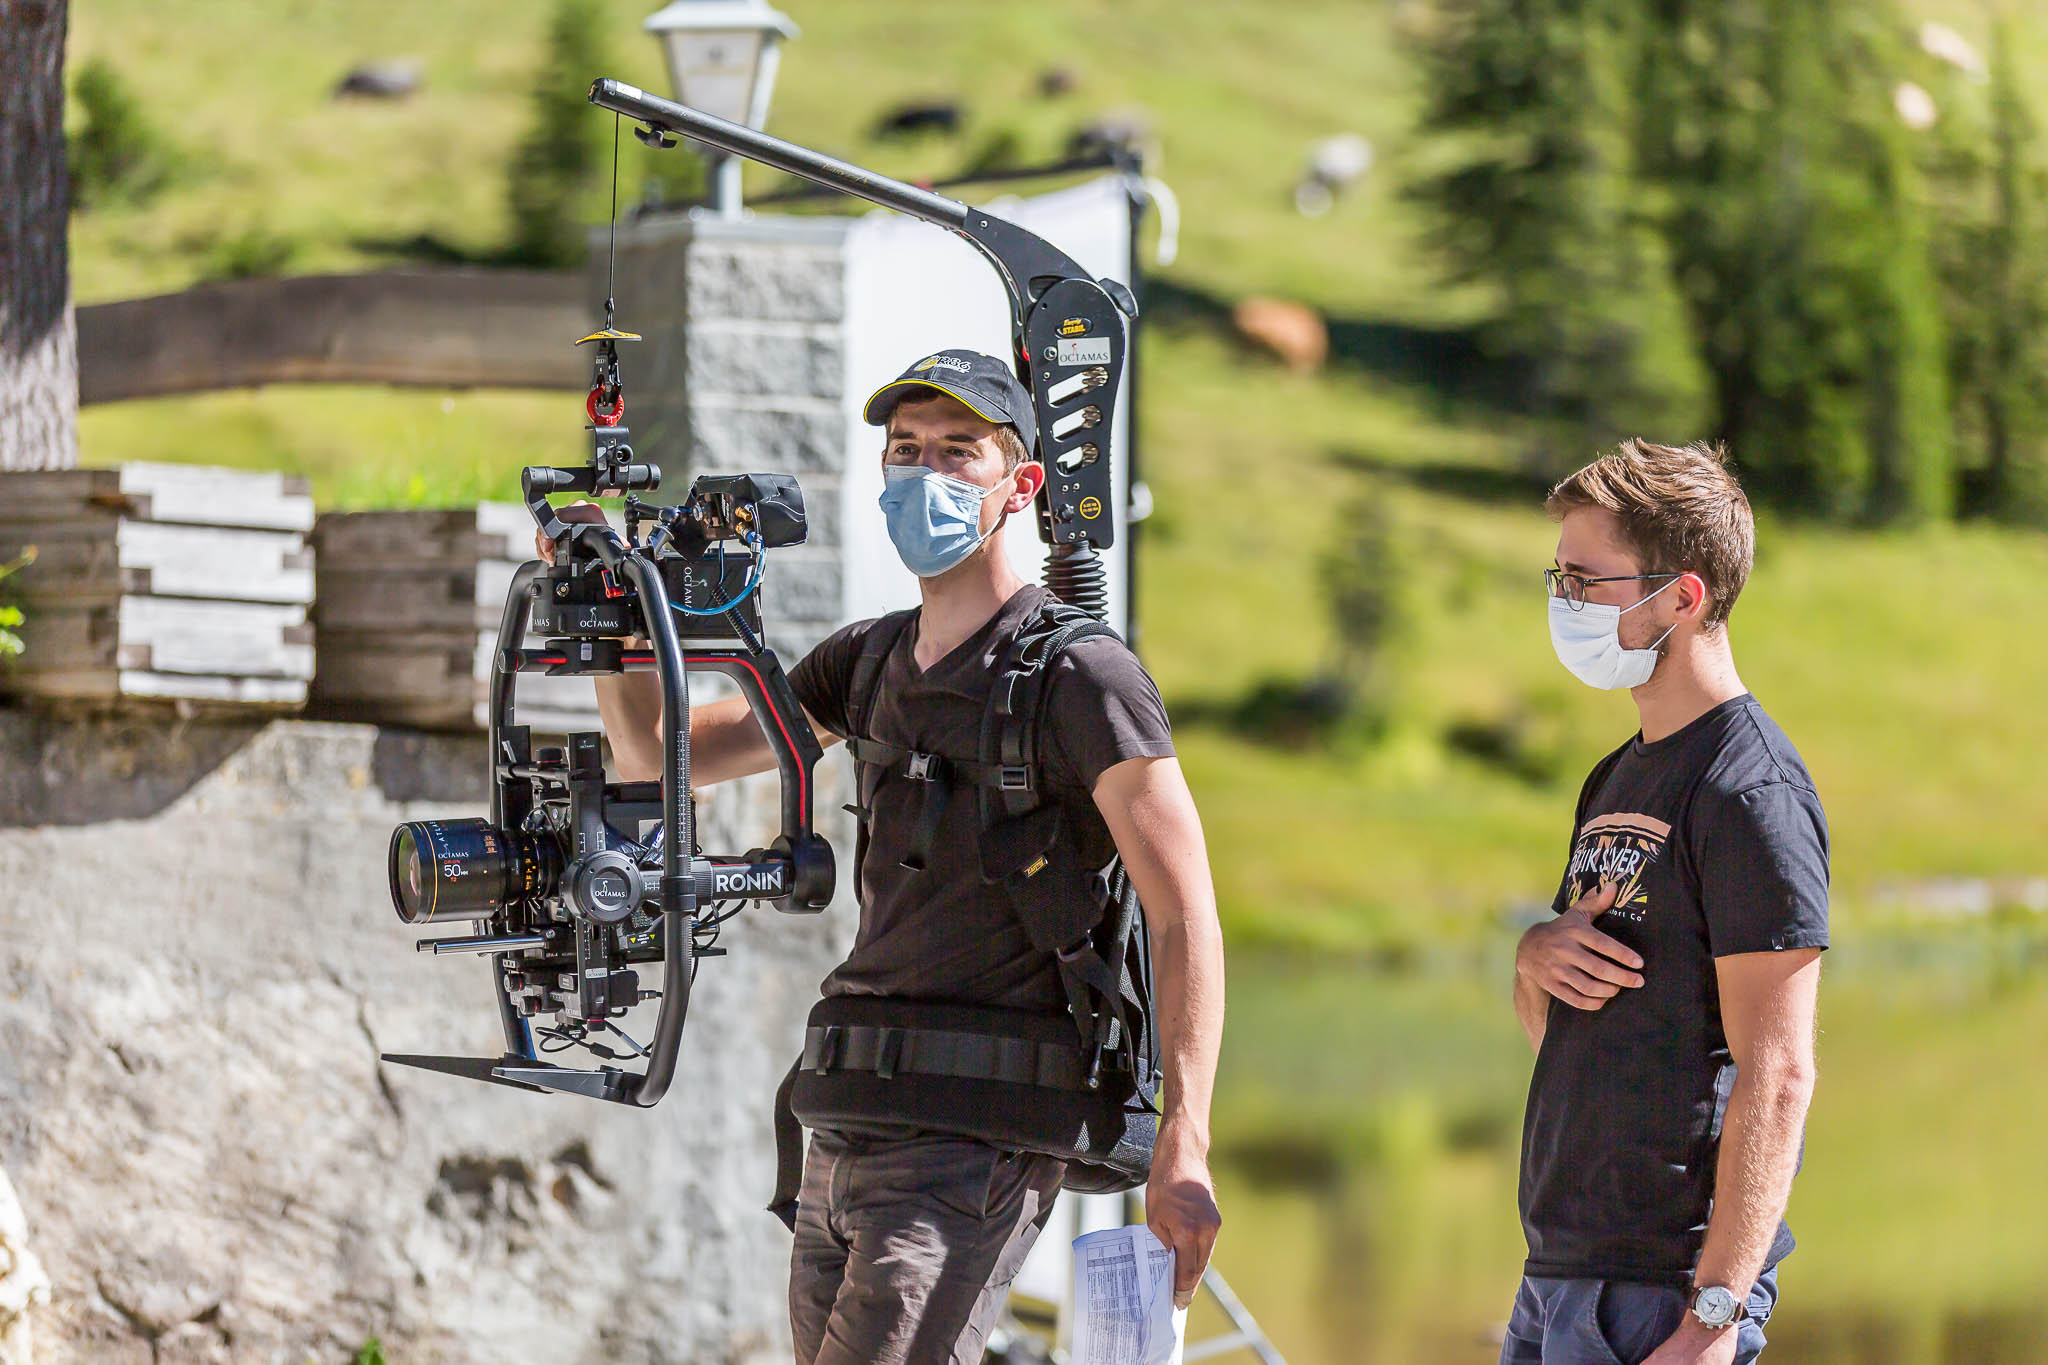 Sebastian Klinger holding camera on set of The Station In-Between